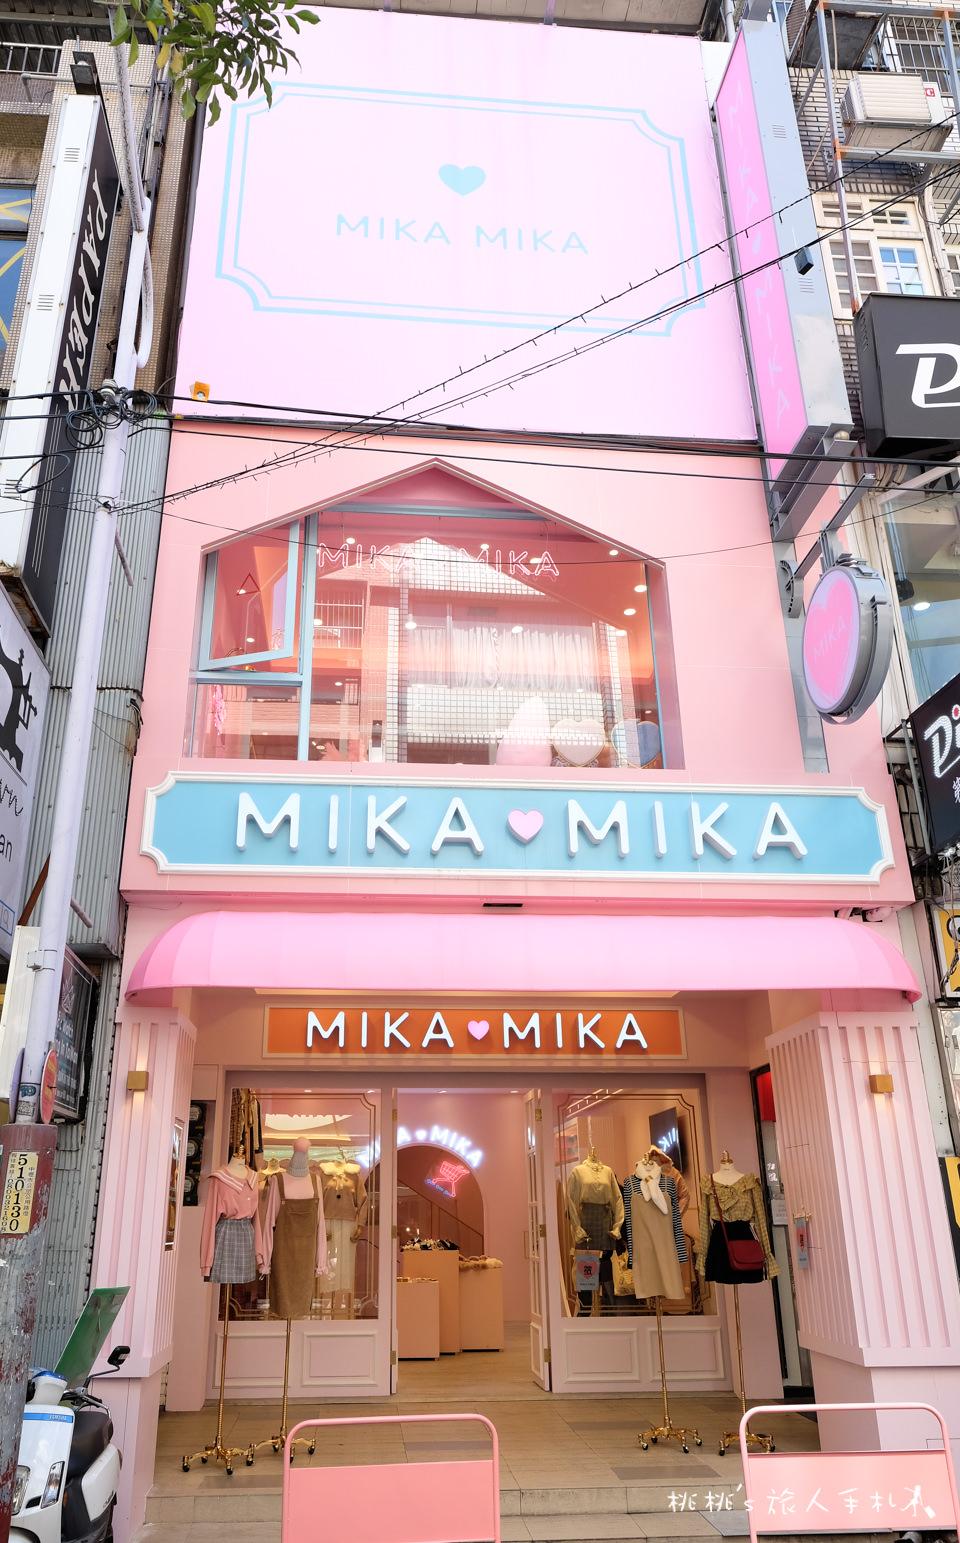 IG打卡美店》MIKA MIKA│網美必朝聖 中壢商圈最美服飾店